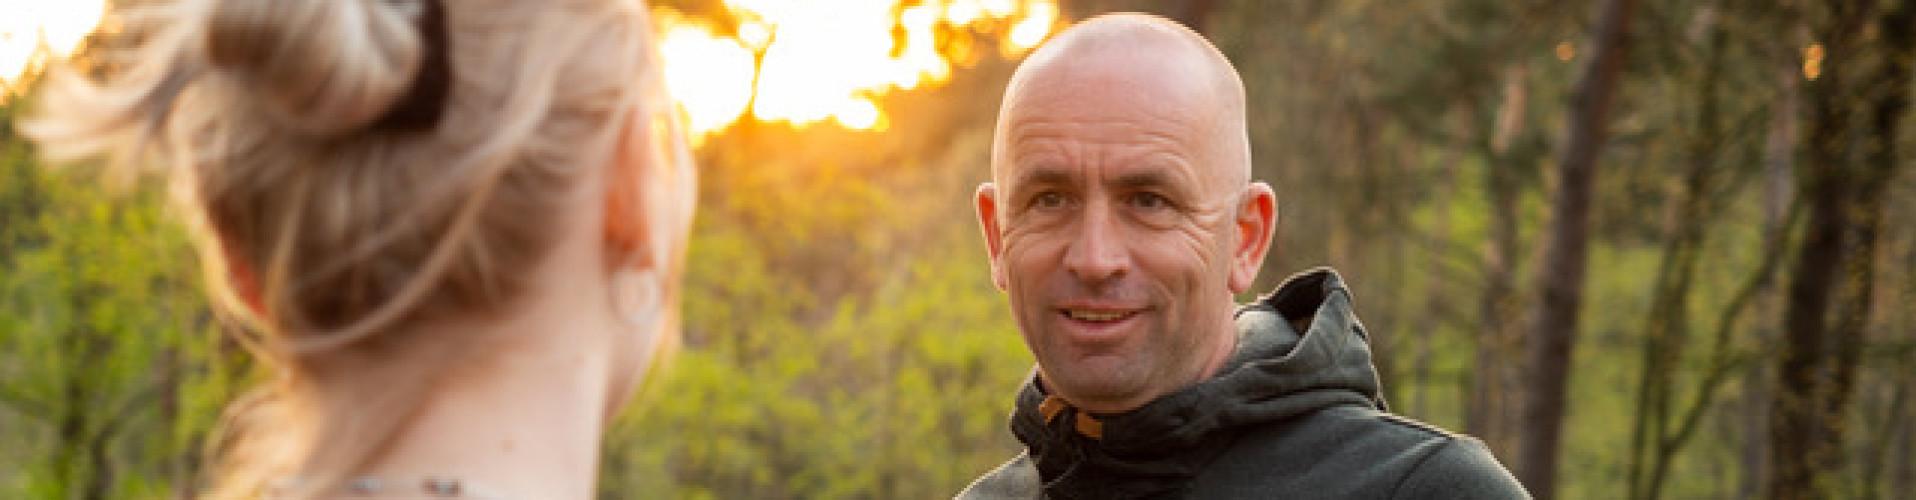 Coach Venlo: begeleiding bij stress en burn out